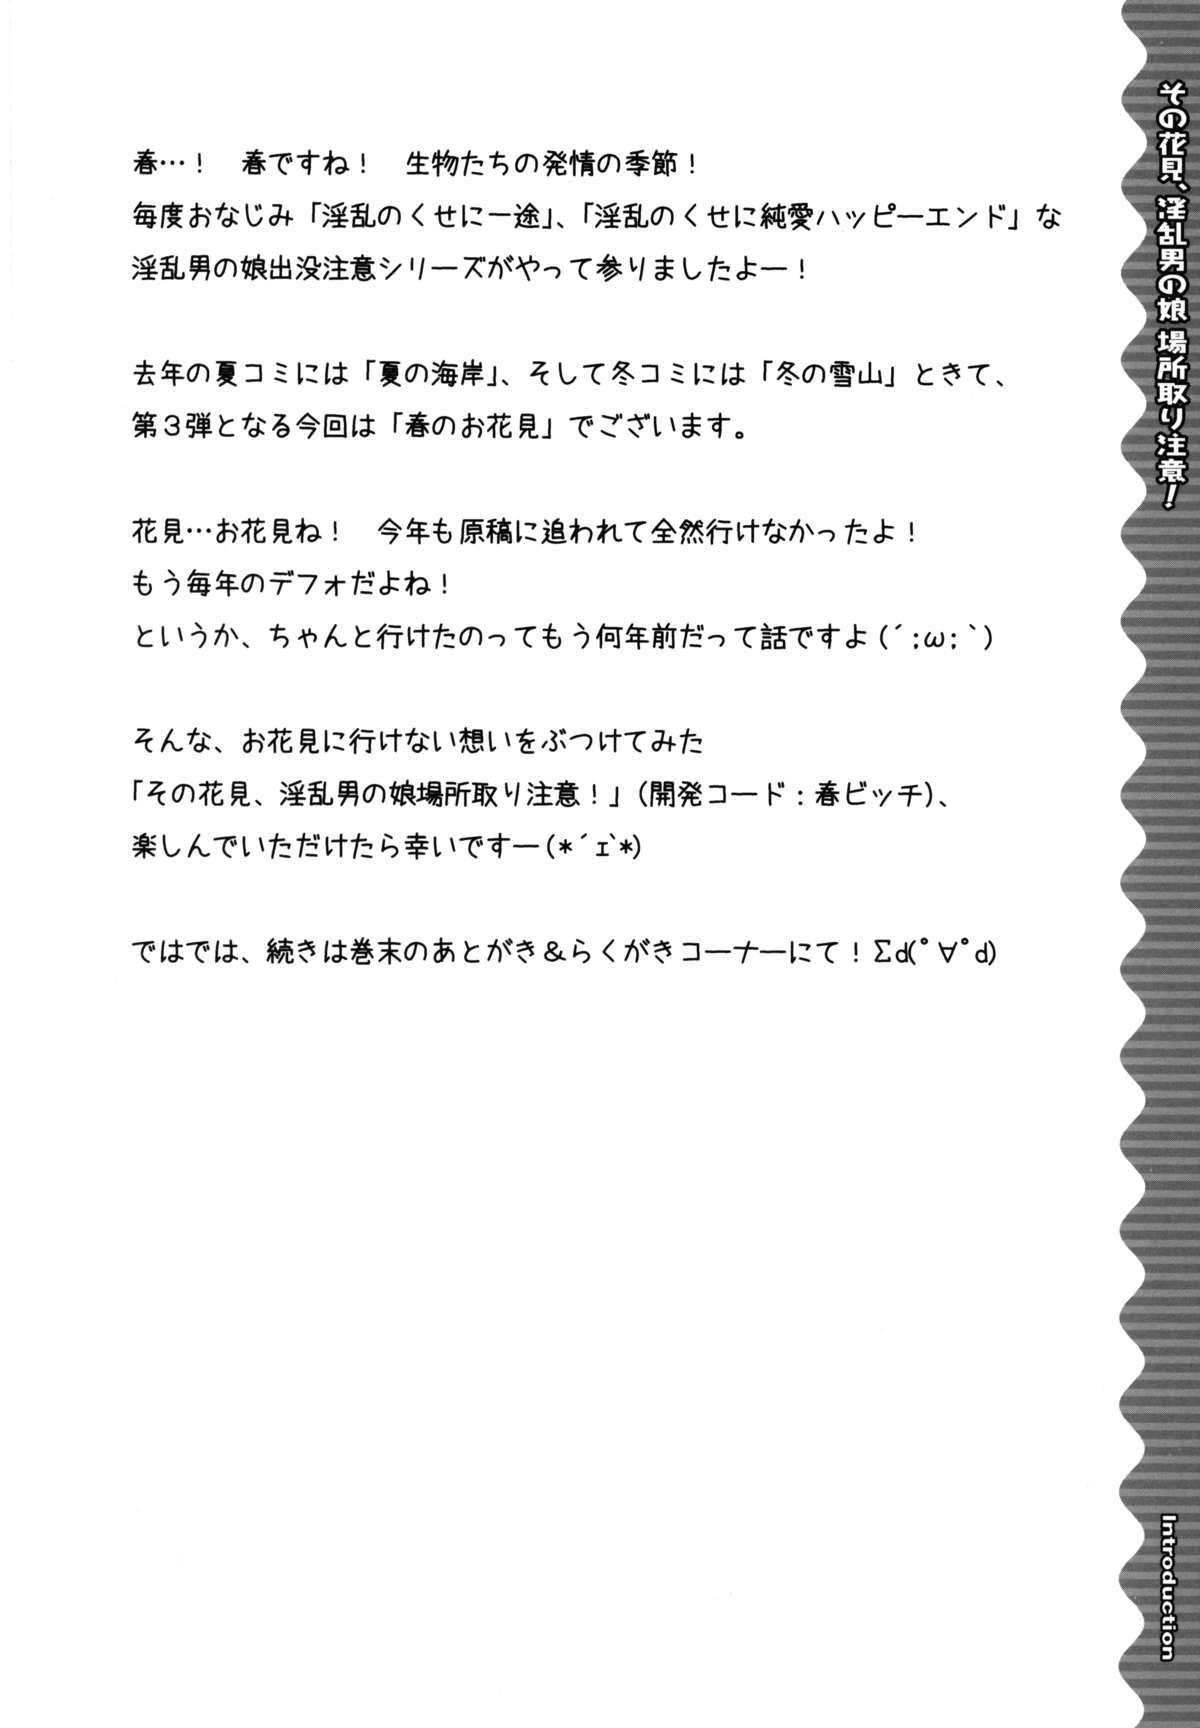 Sono Hanami, Inran Otokonoko Basho Tori Chuui | Beware of slutty traps while claiming places for cherry blossom viewing! 2